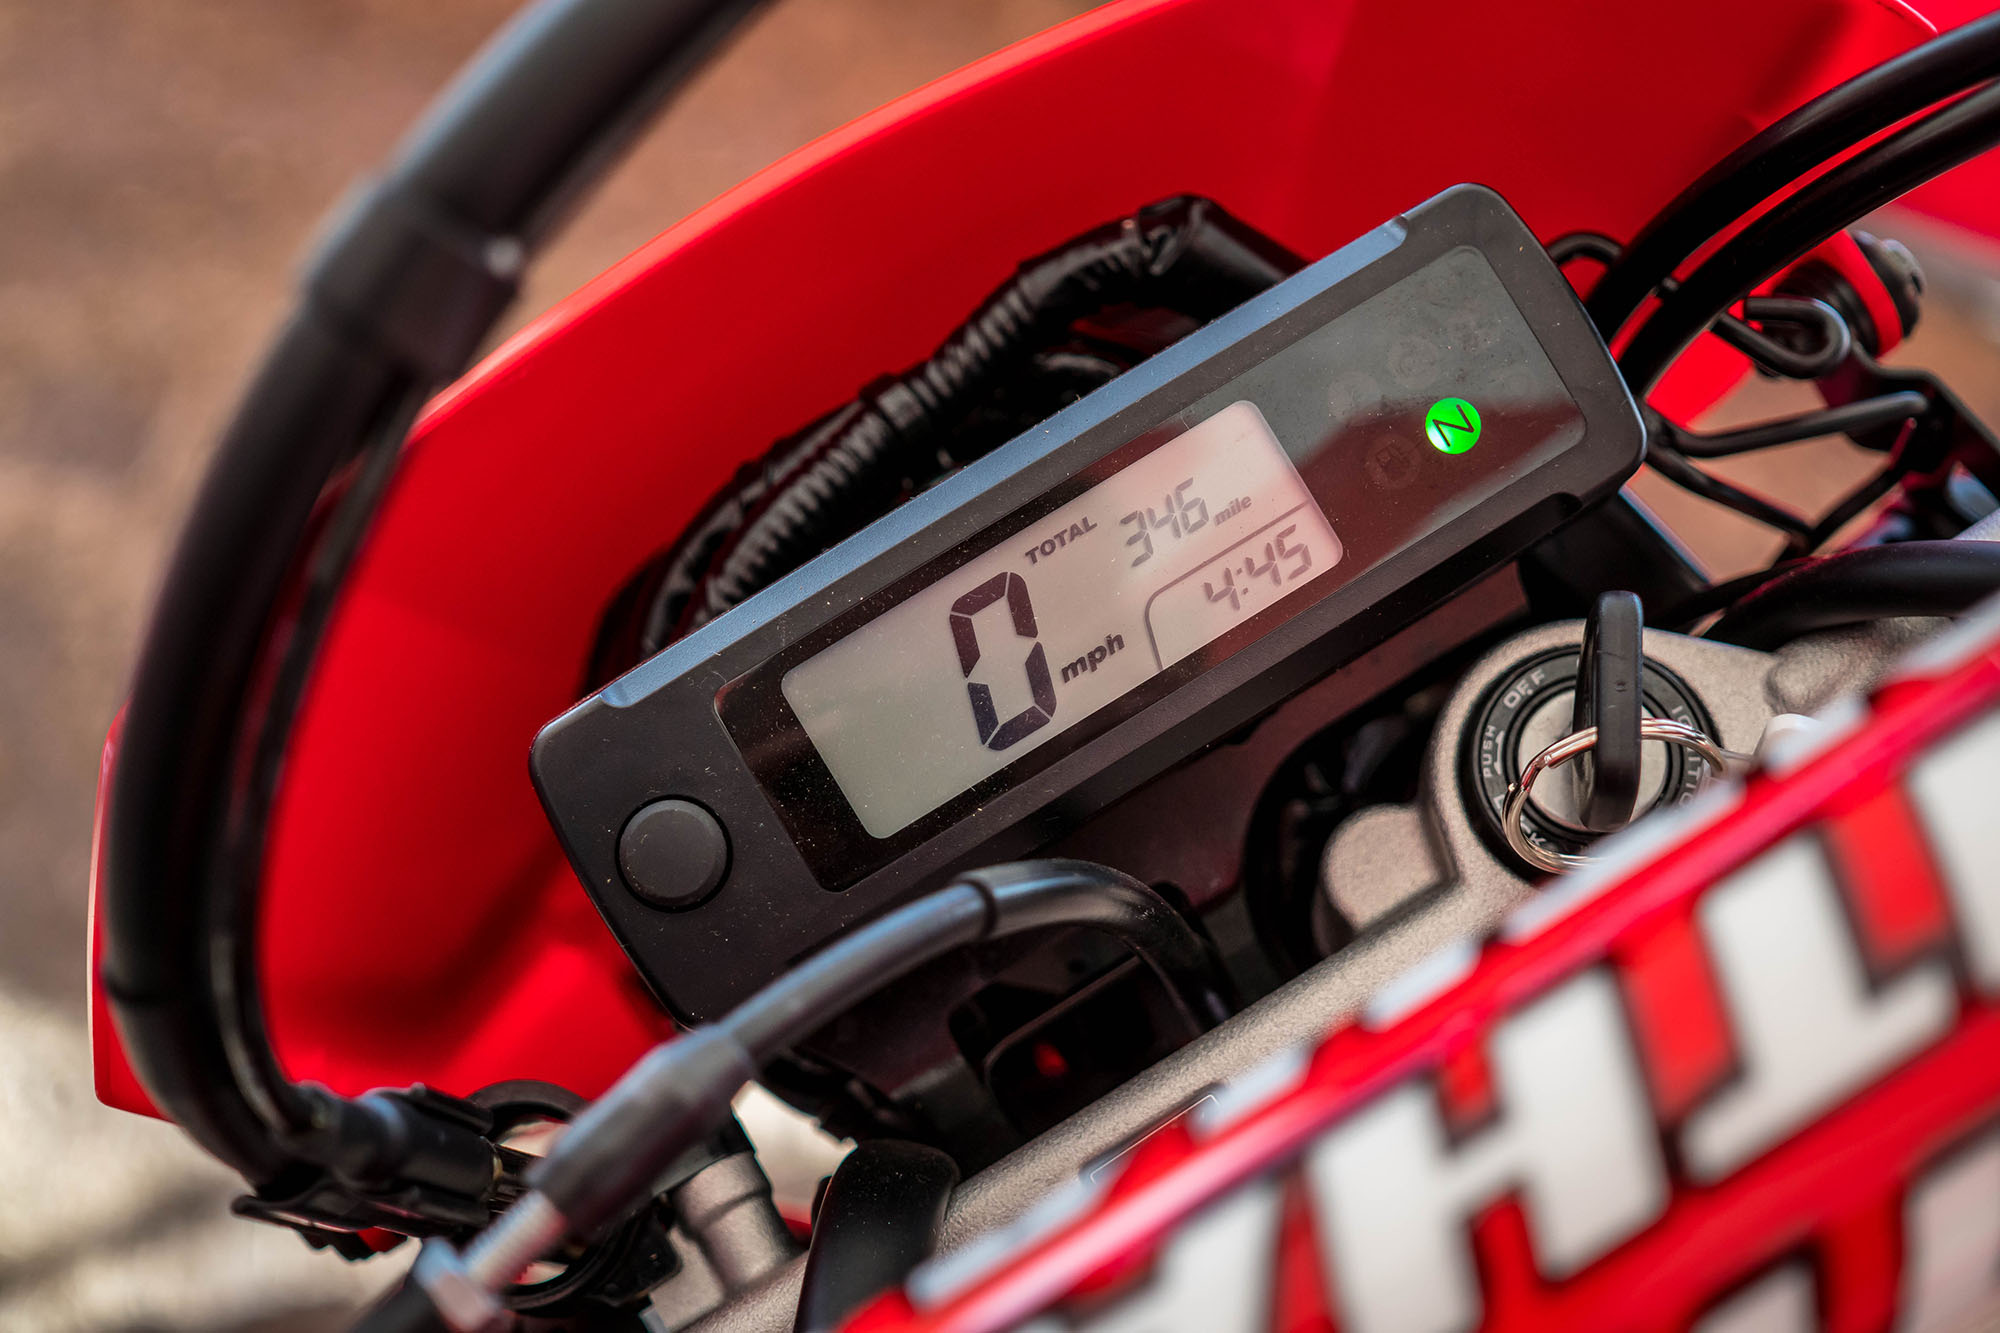 HondaCRF450Lintro-Cudby-014.jpg